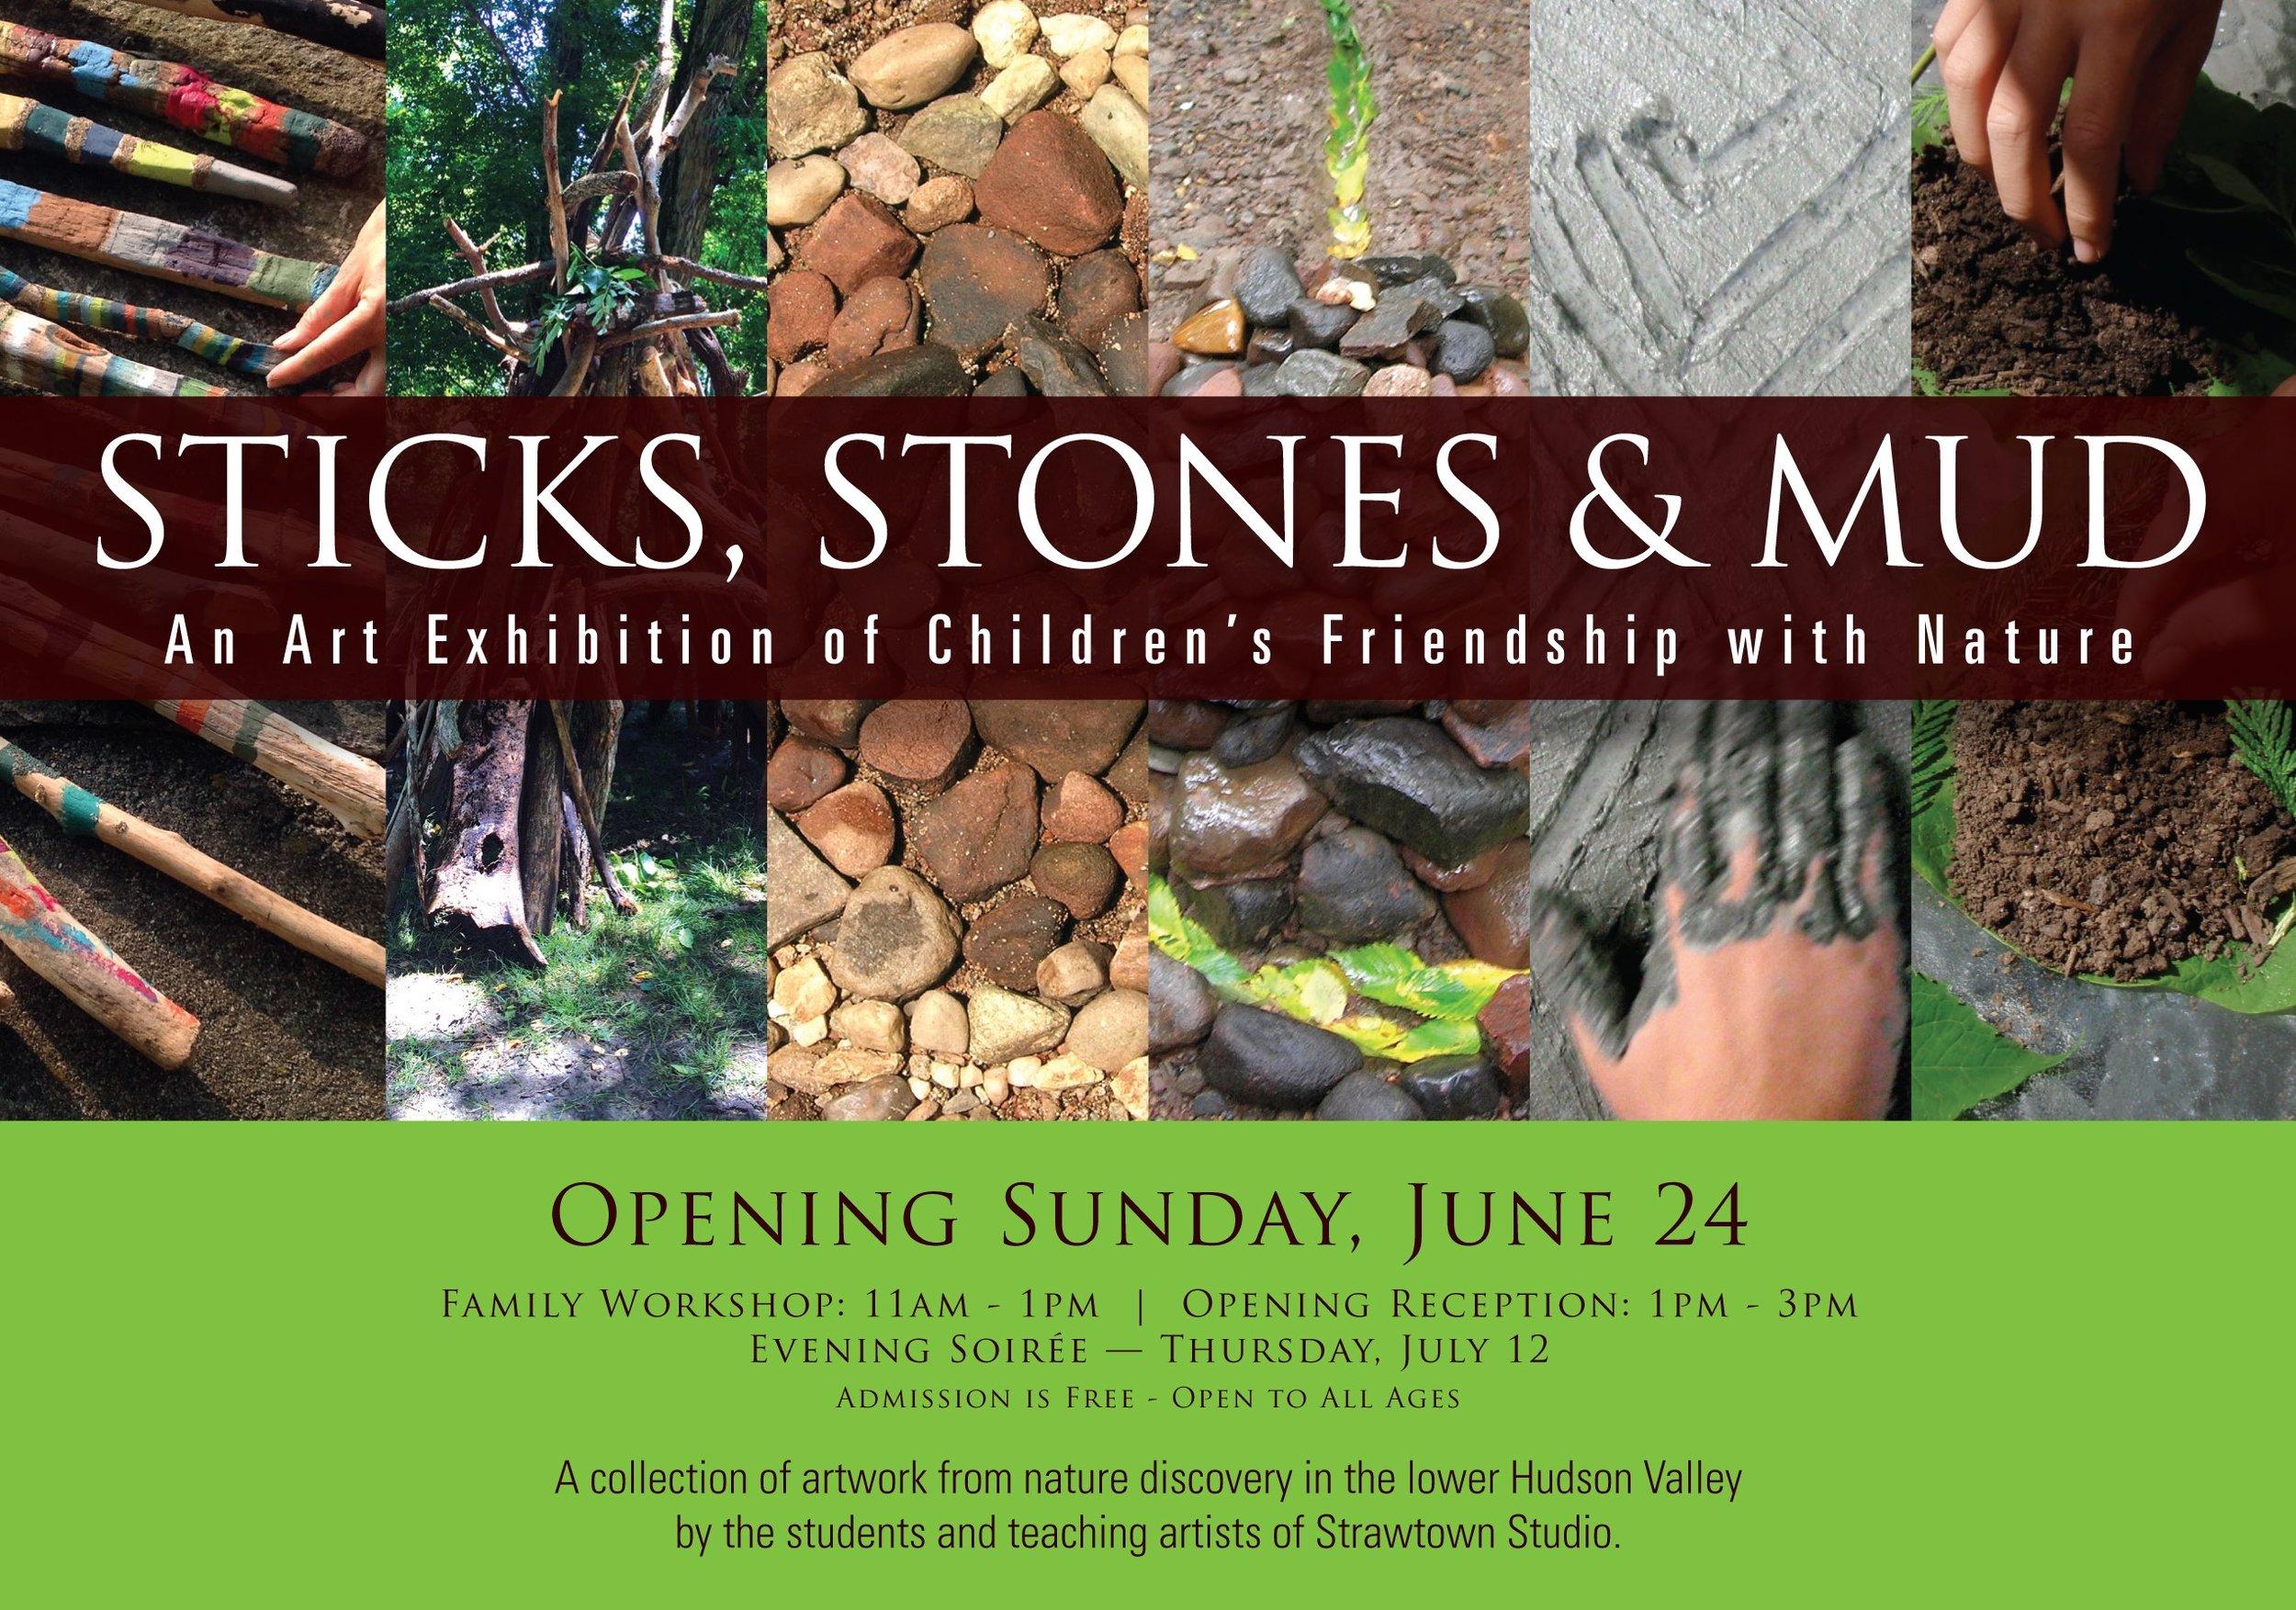 Sticks, Stones & Mud